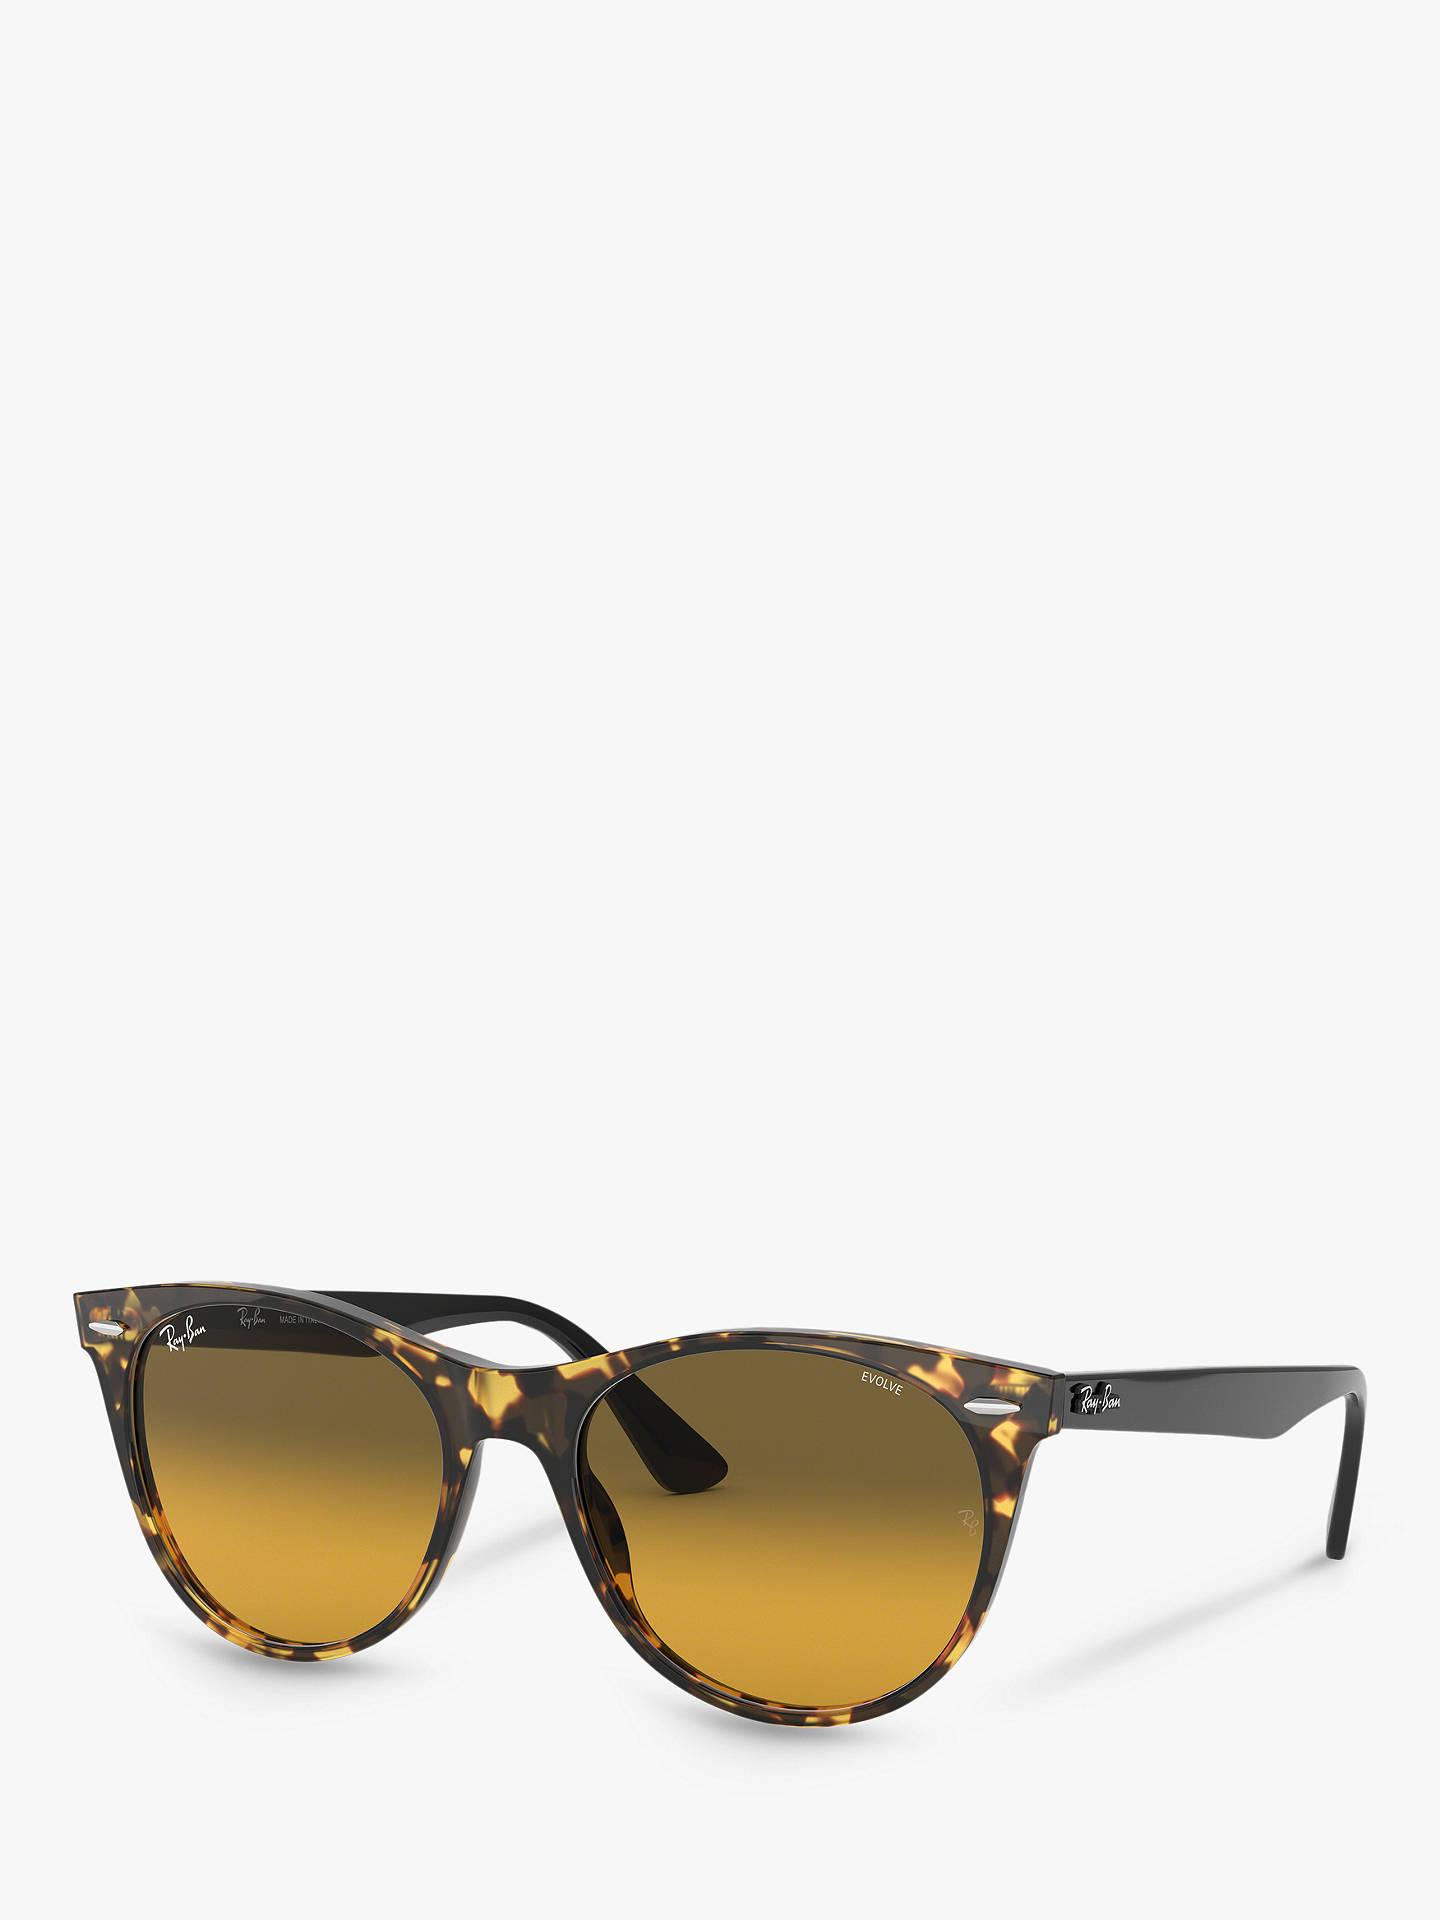 5109b1fe61 BuyRay-Ban RB2185 Women s Wayfarer Sunglasses